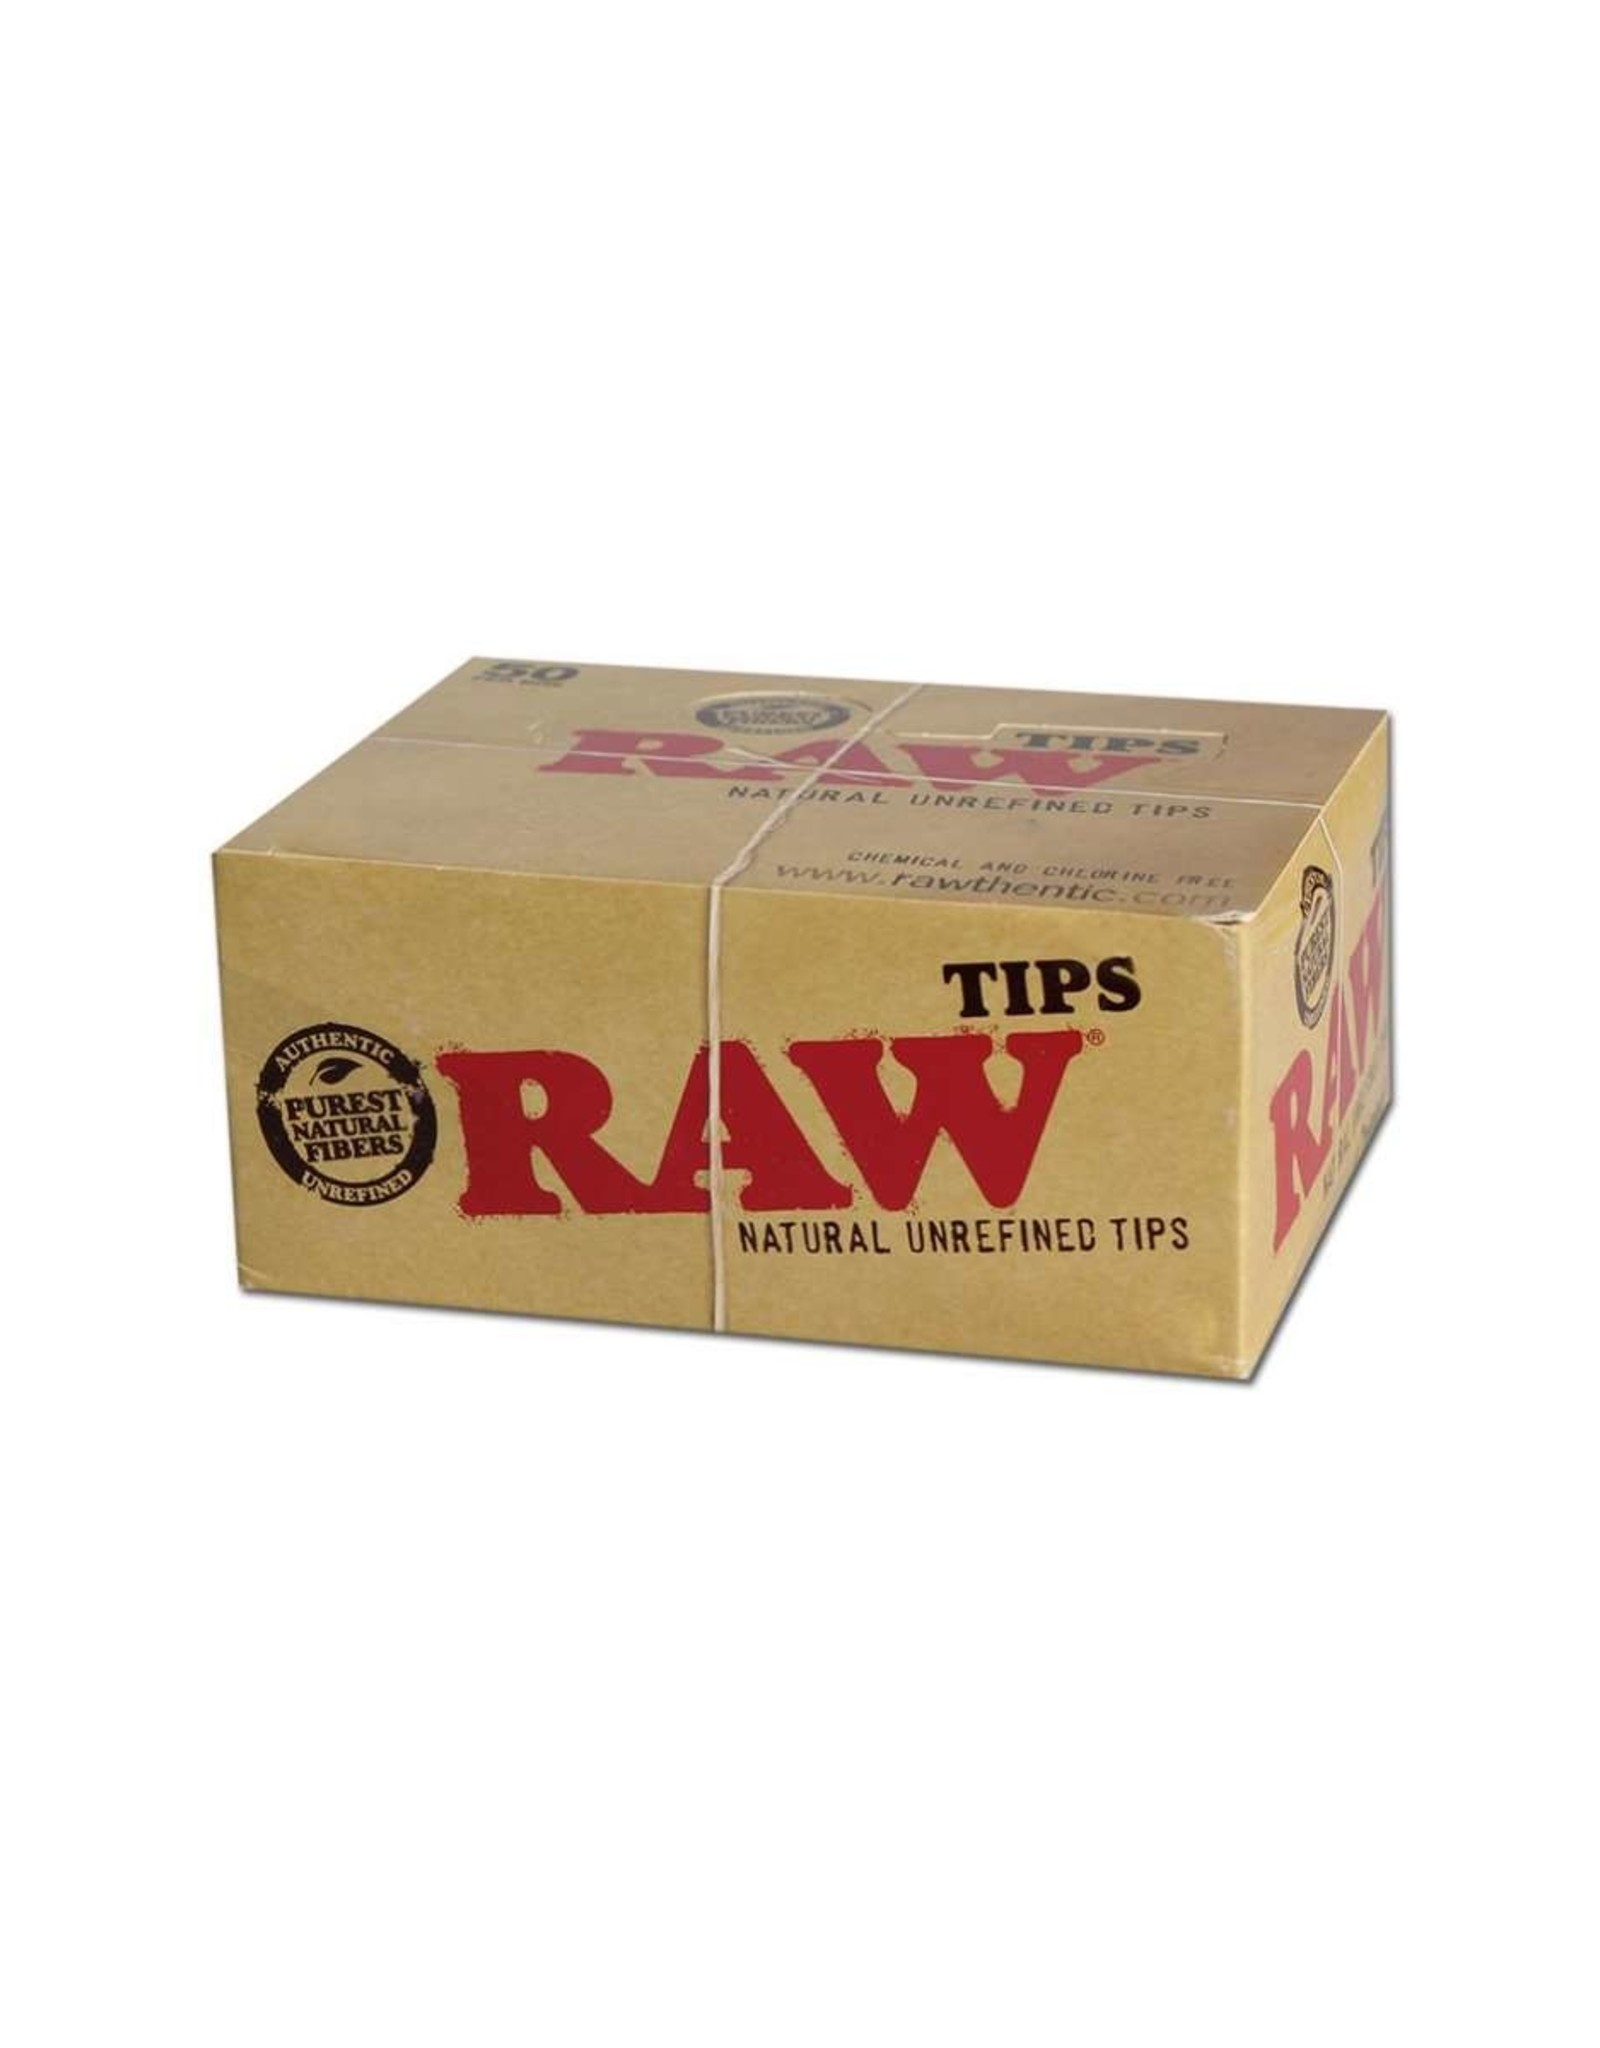 RAW RAW Tips Box